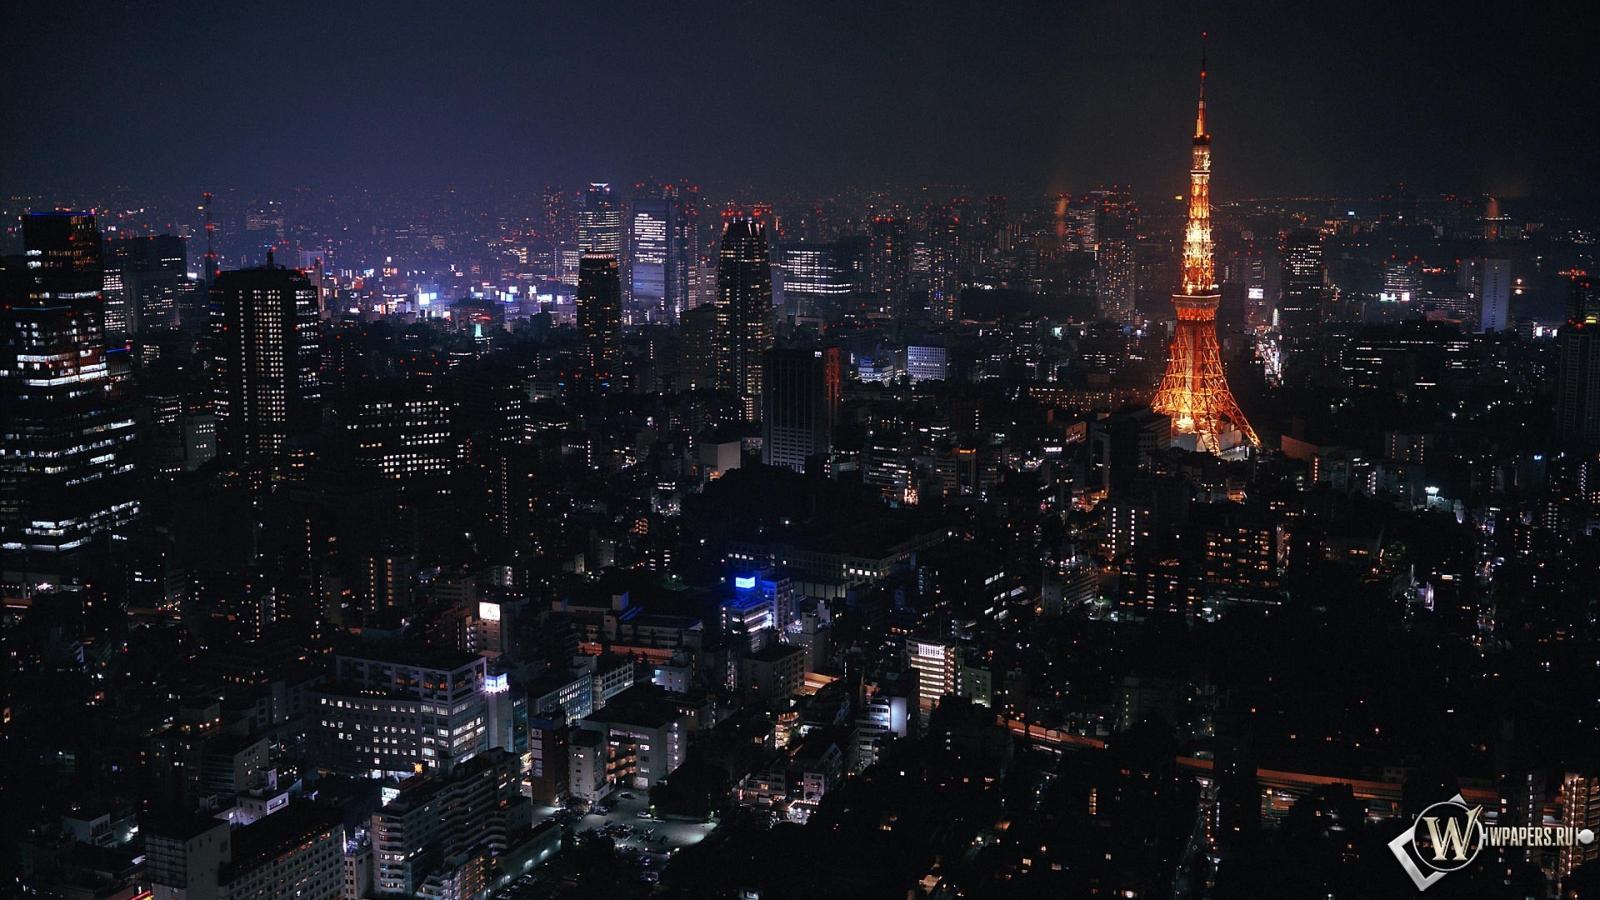 Япония токио 1600x900 картинки